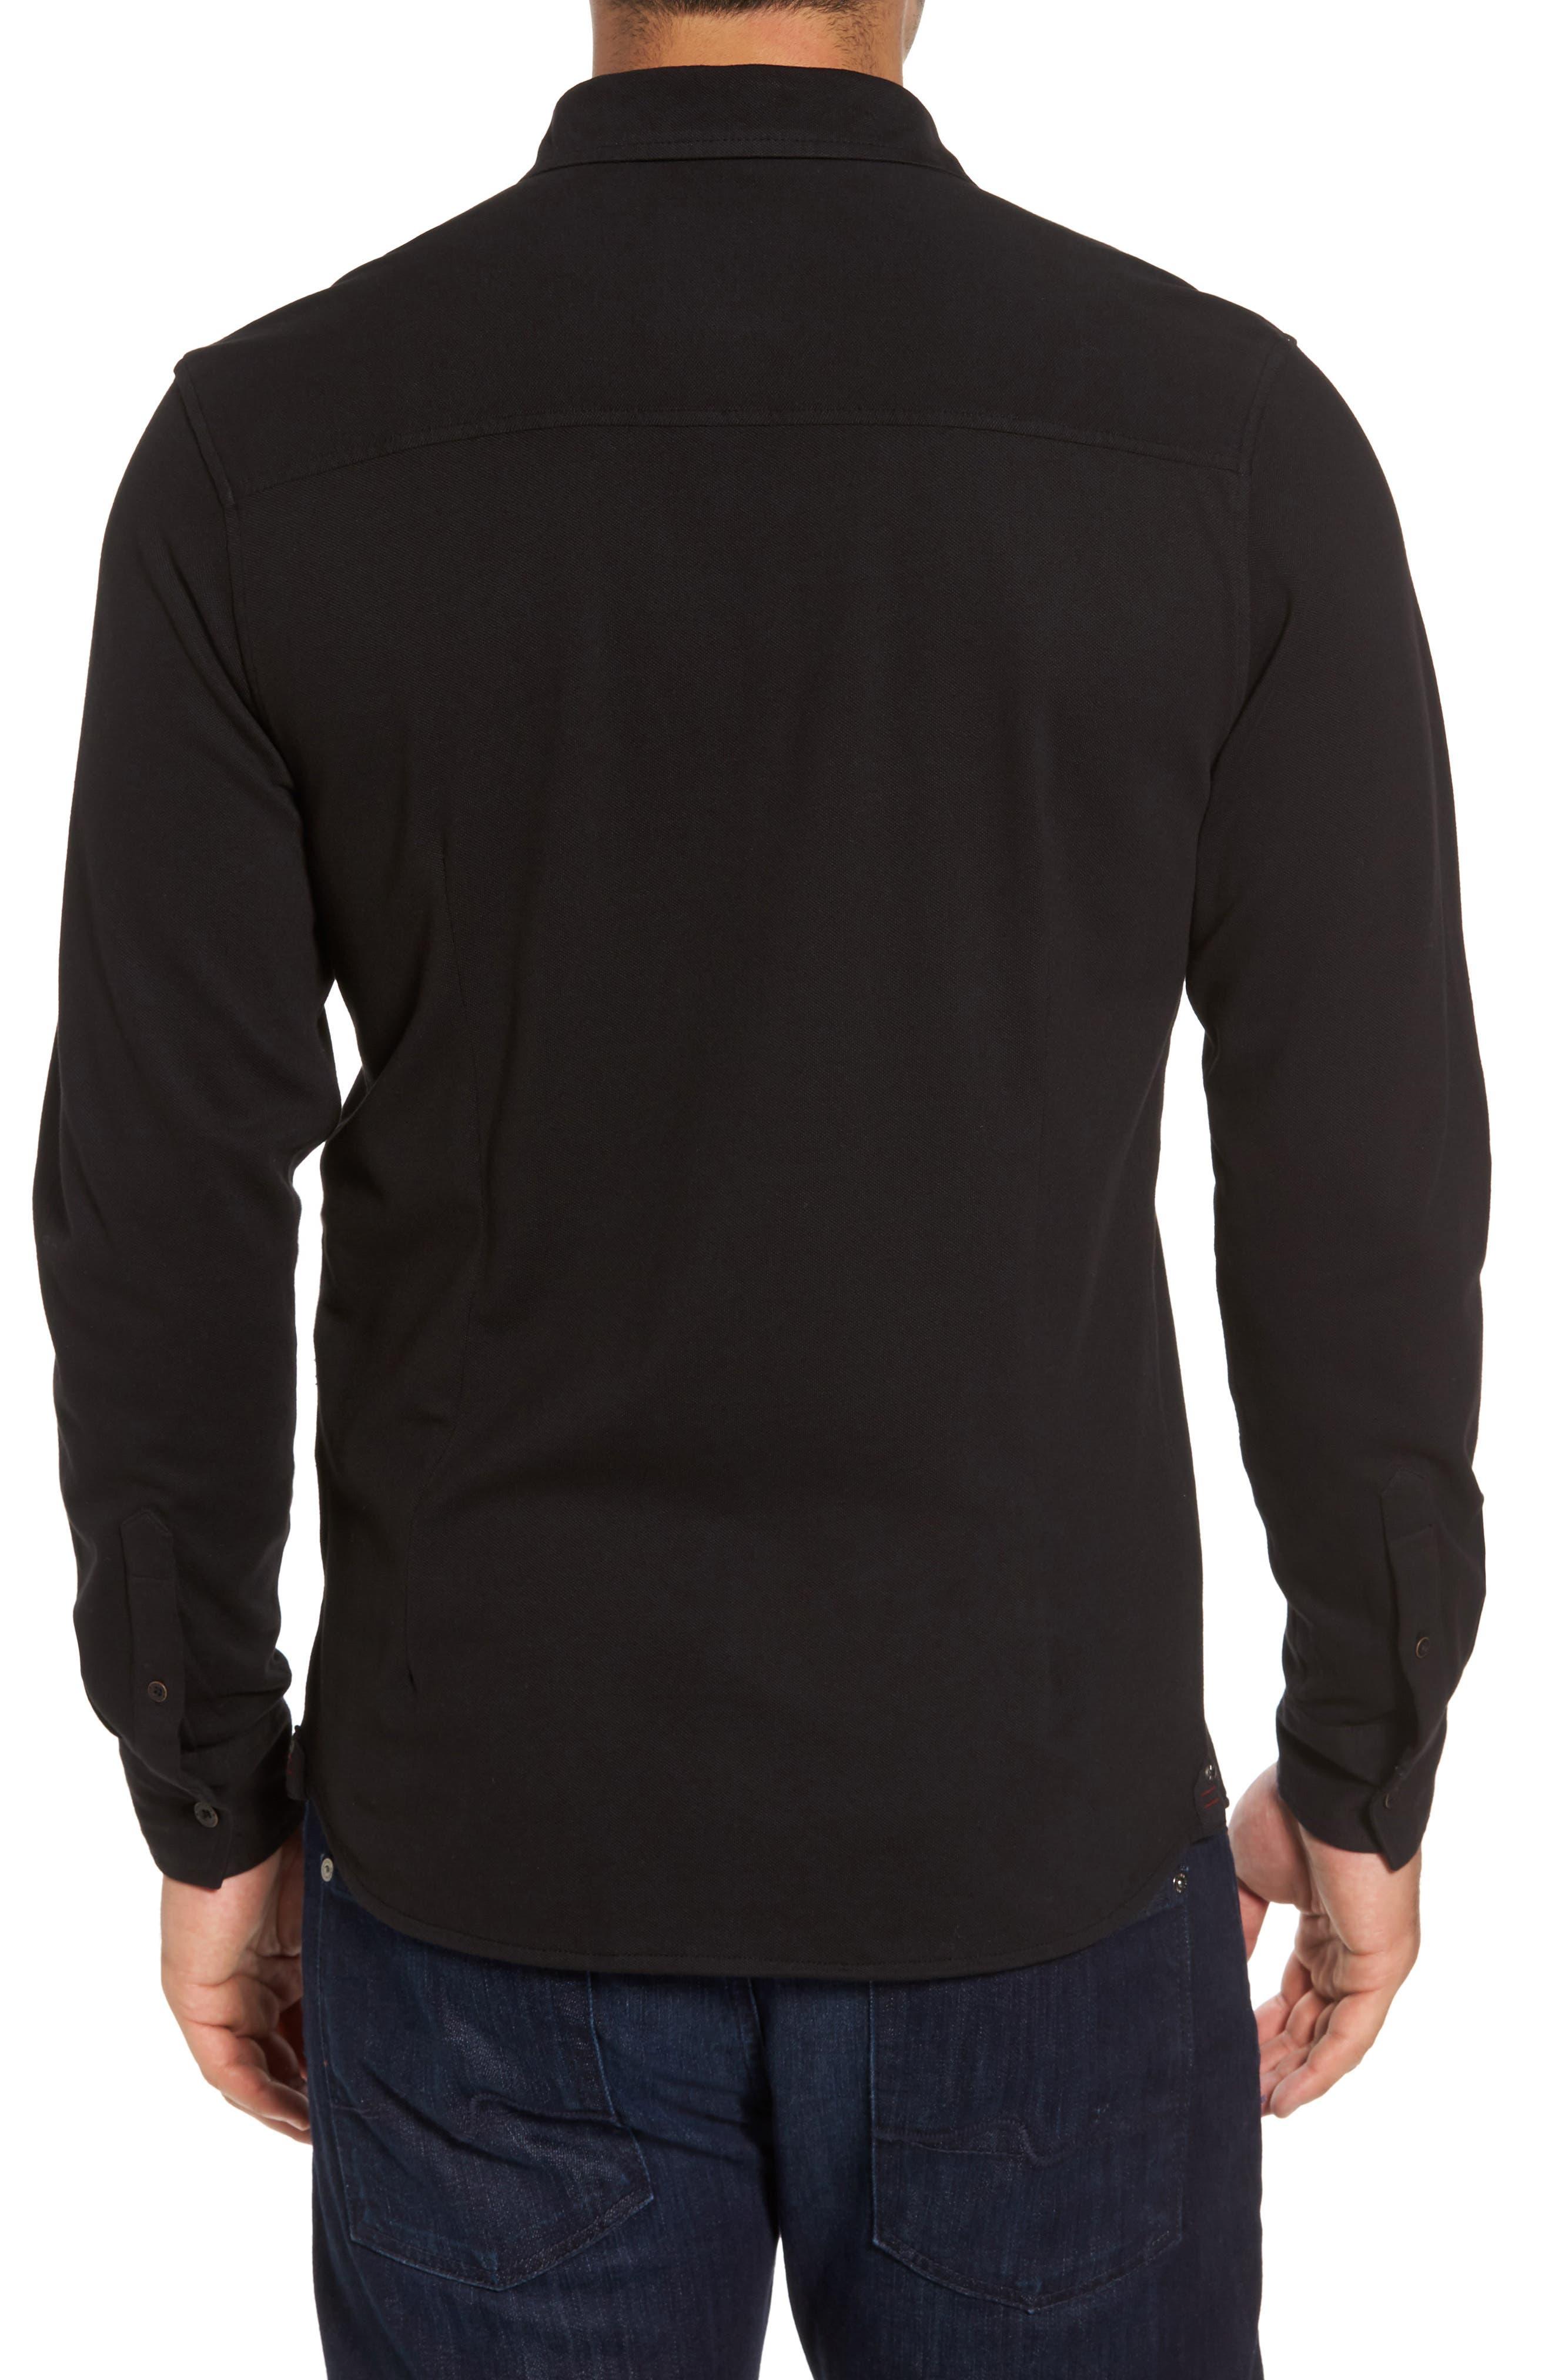 Shively Piqué Knit Sport Shirt,                             Alternate thumbnail 2, color,                             001